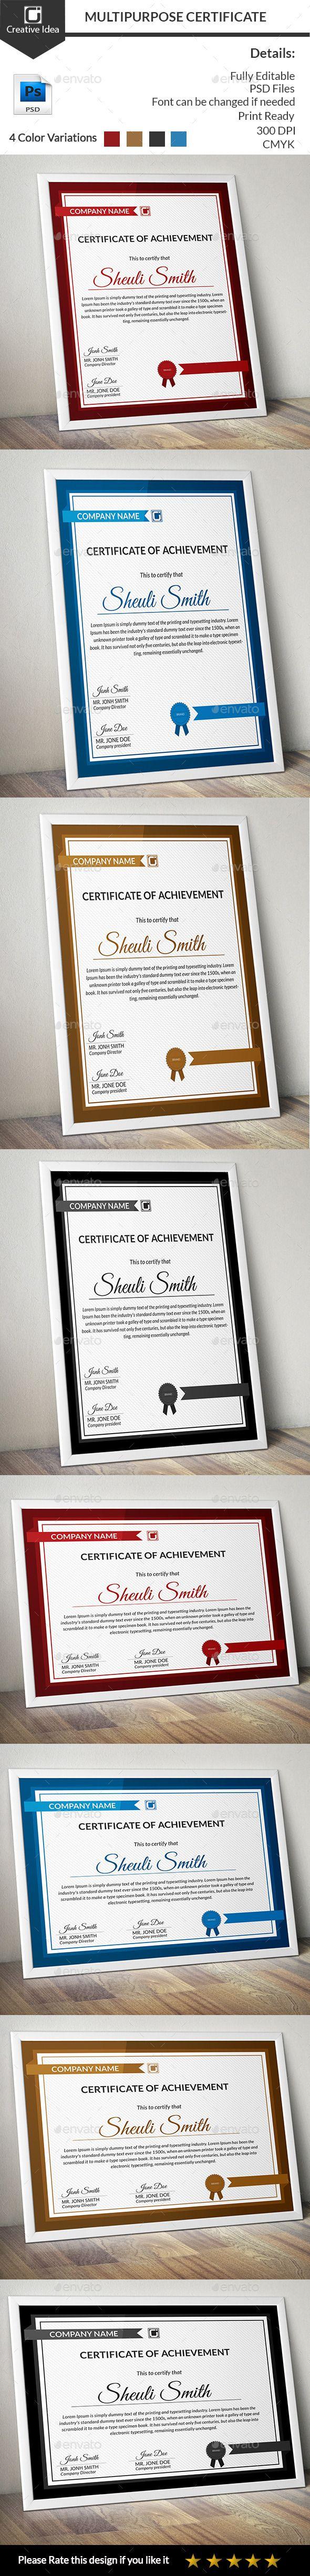 Multipurpose Certificate Template PSD. Download here: http://graphicriver.net/item/multipurpose-certificate/12294141?ref=ksioks